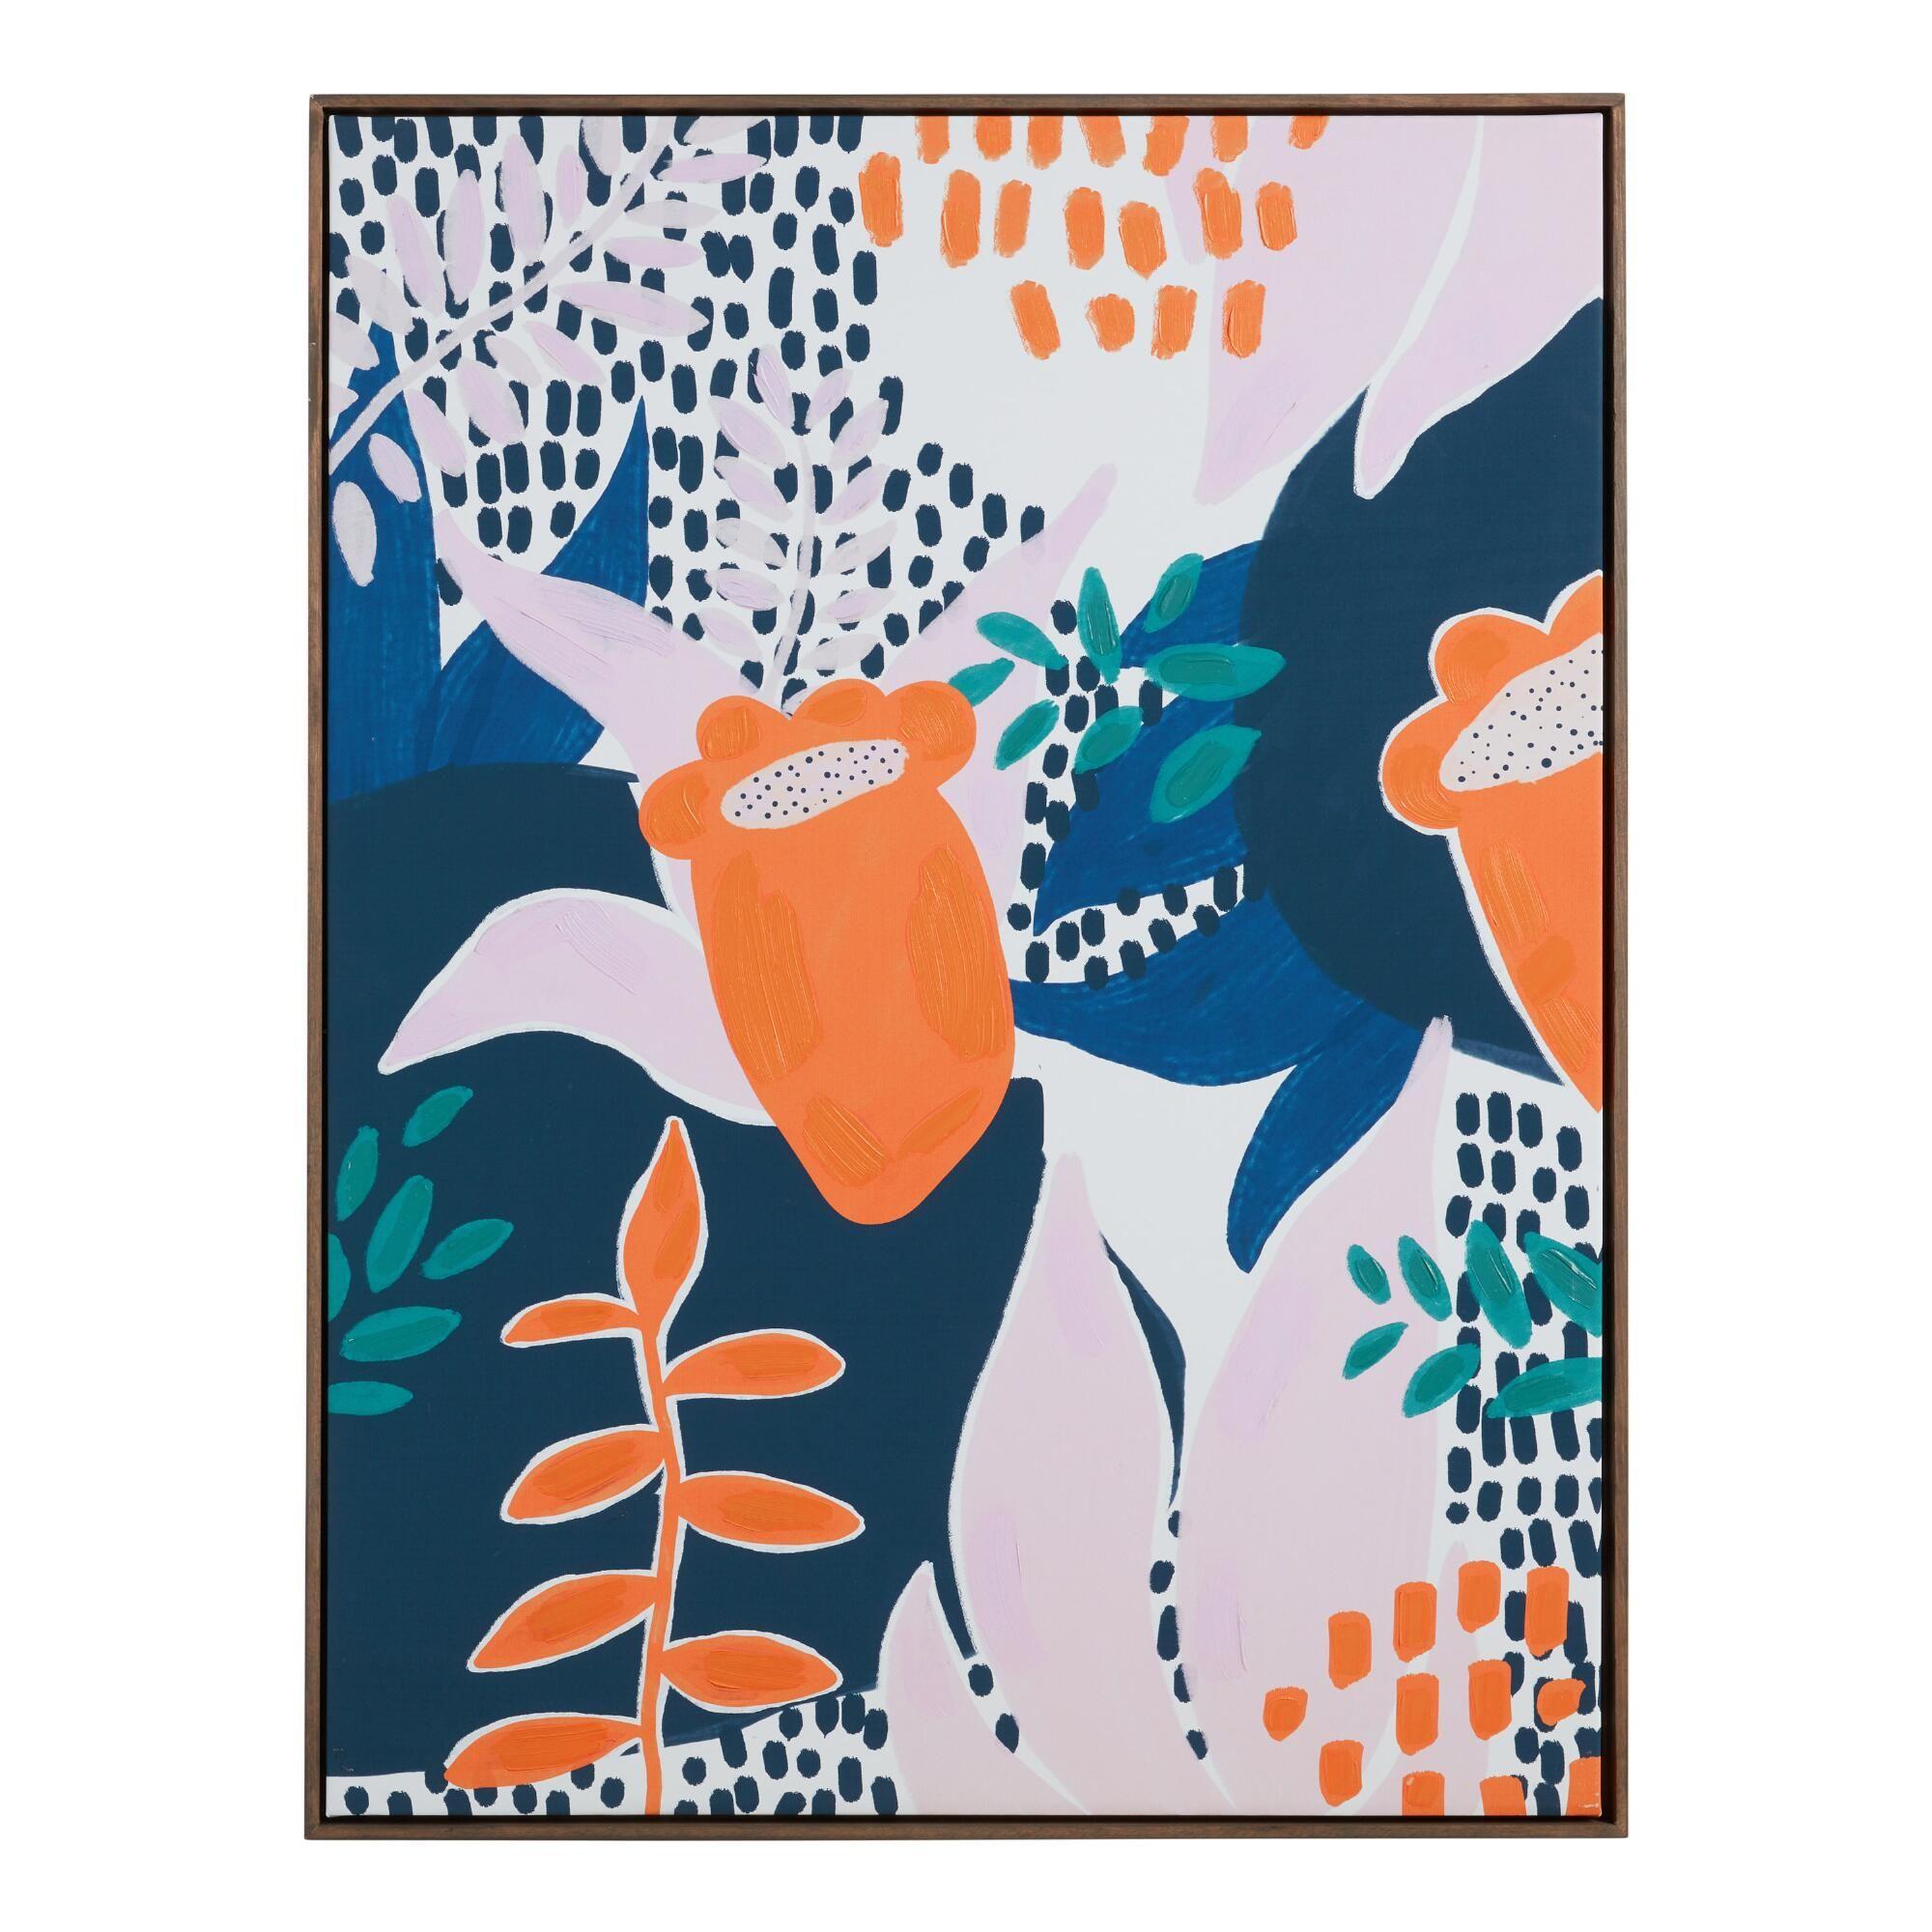 Retro Vogue Poster art print Vintage Fashion poster Panel effect Wood wall art